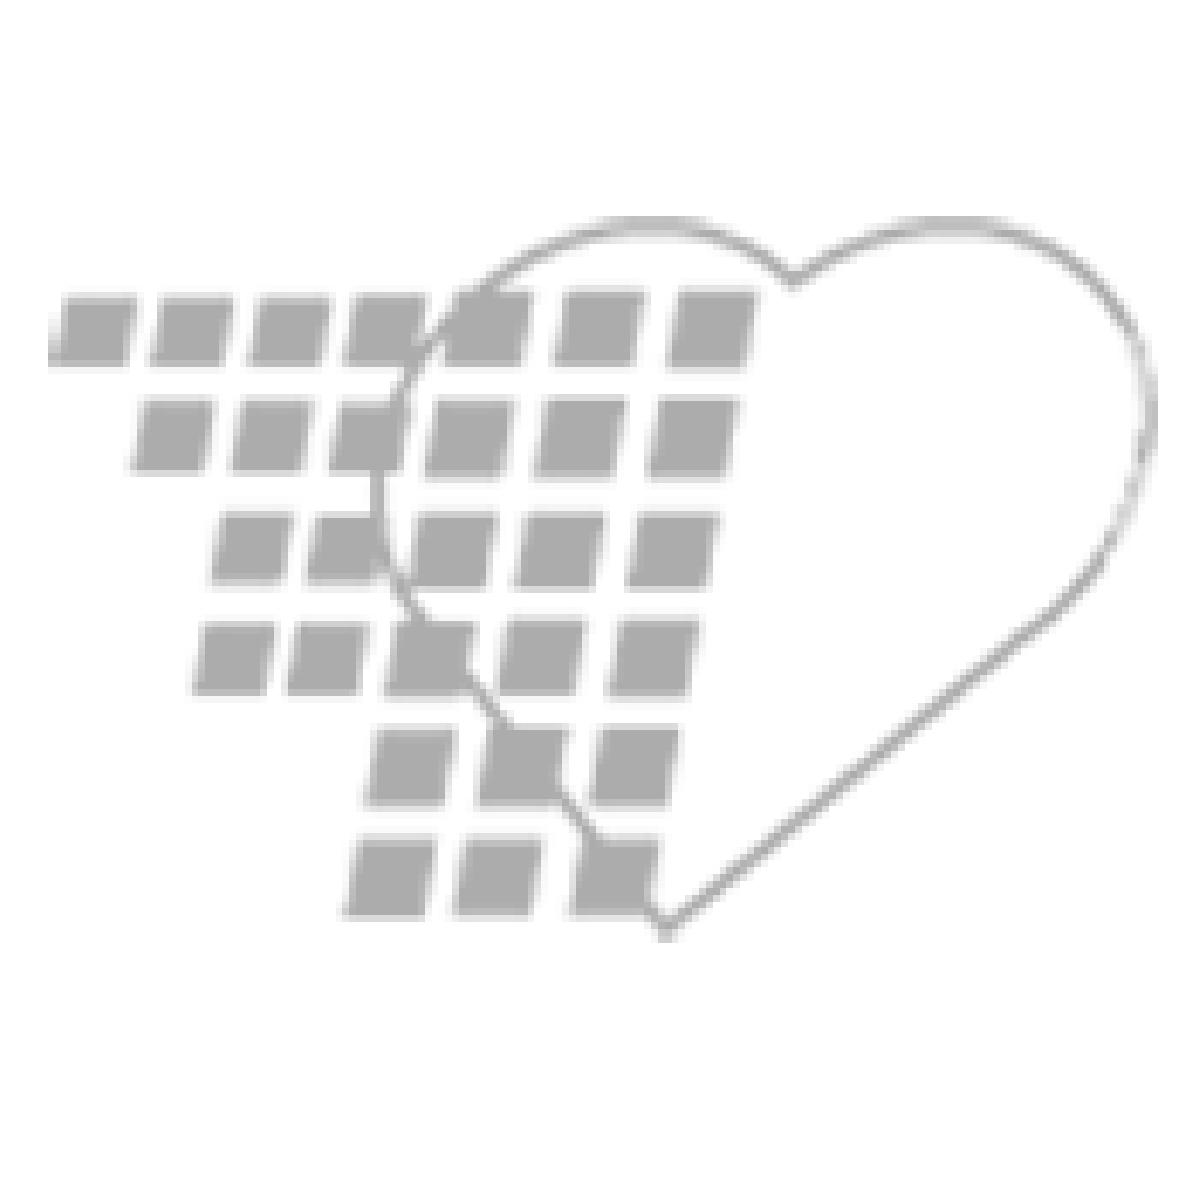 "02-26-1423 - Autoguard IV Cath 22G x 1"" Wingless"